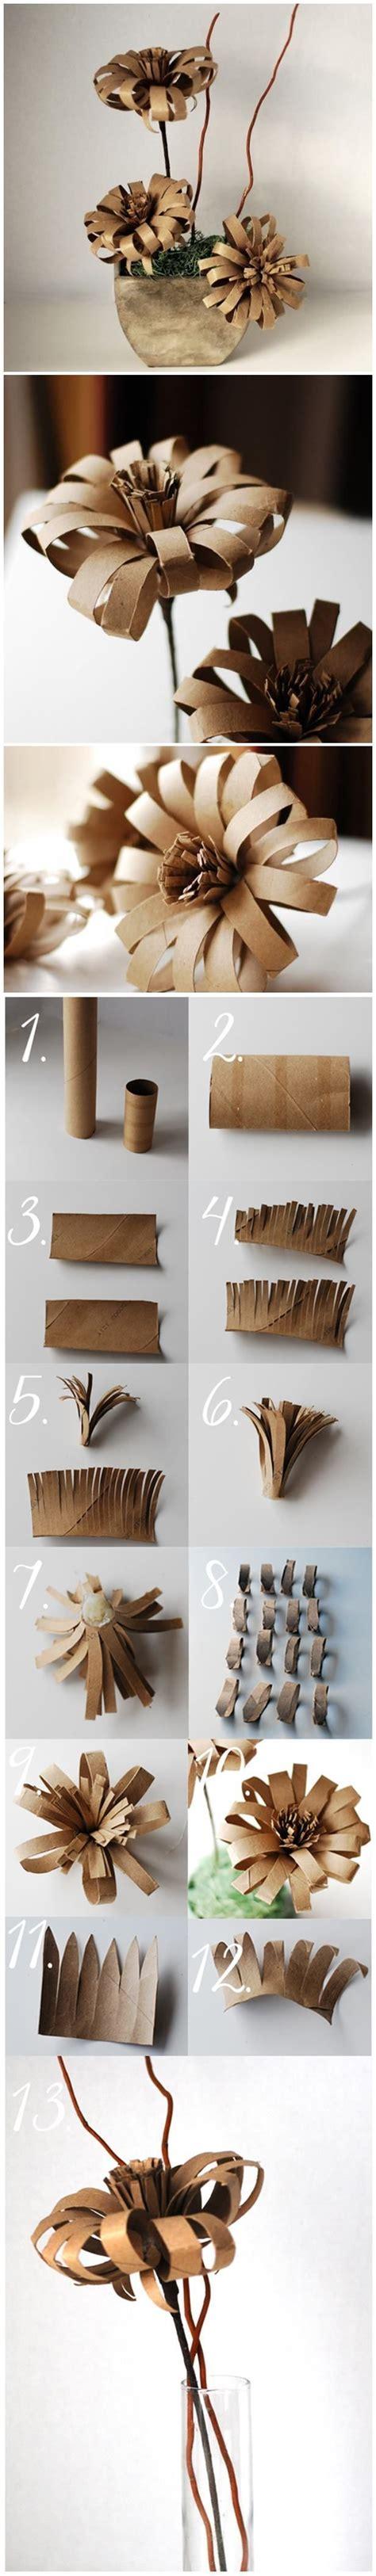 M S Toilet Paper by Best 25 Toilet Paper Rolls Ideas On Pinterest Paper